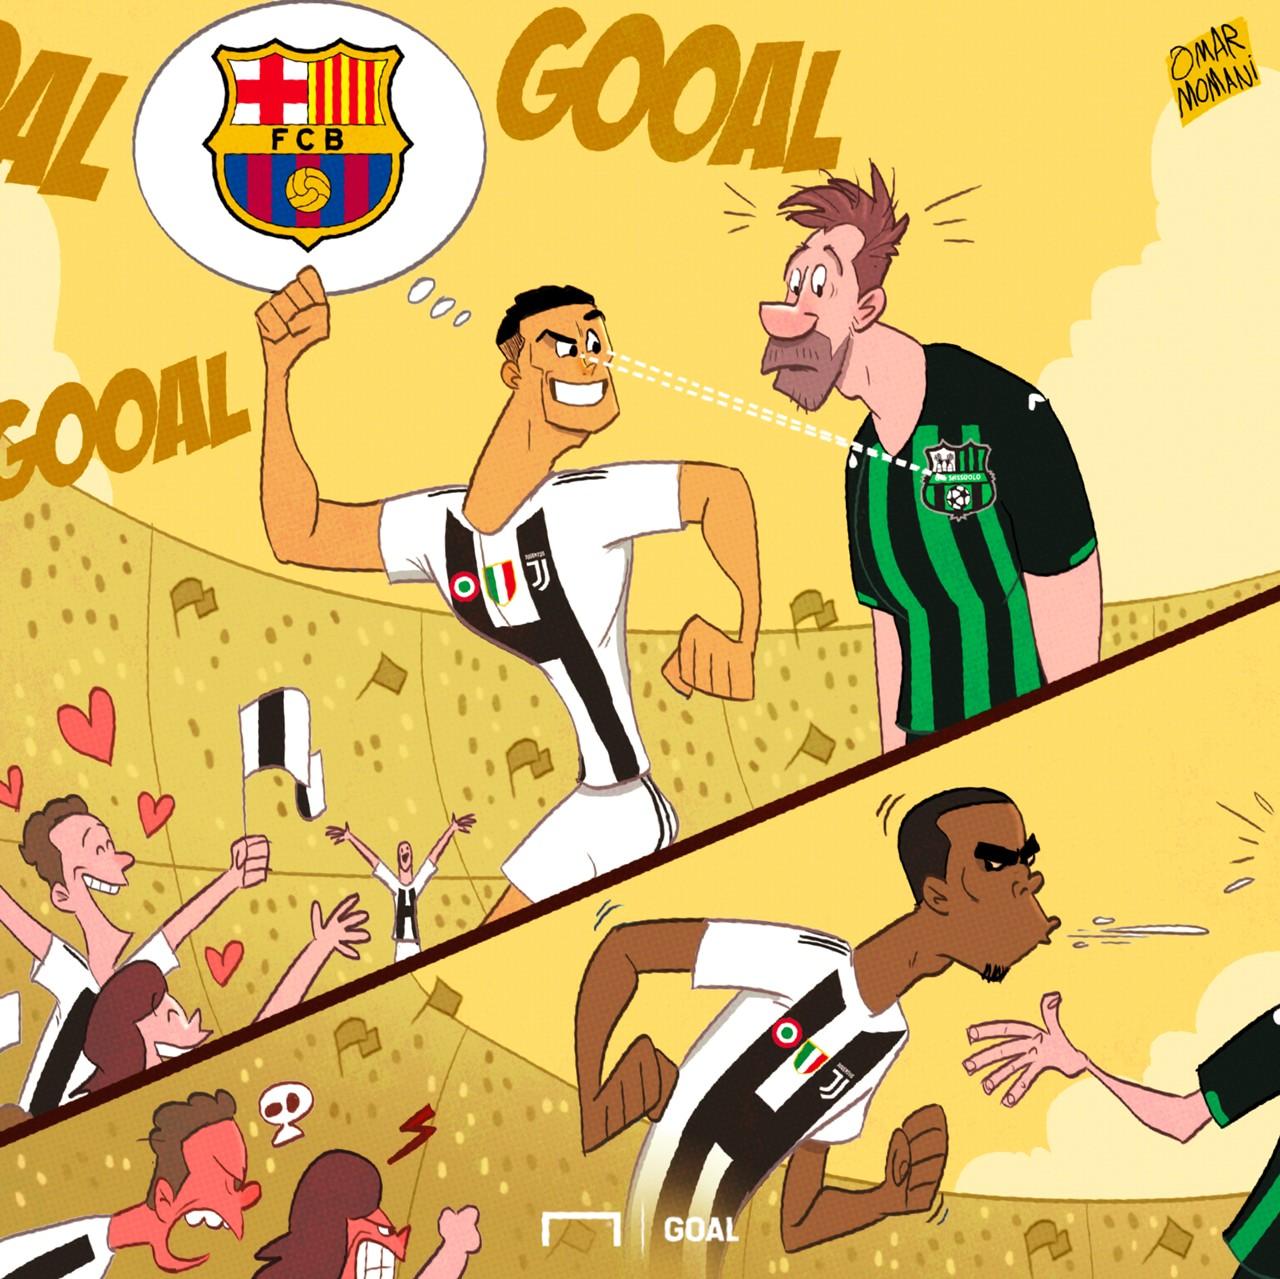 Ronaldo's first goal